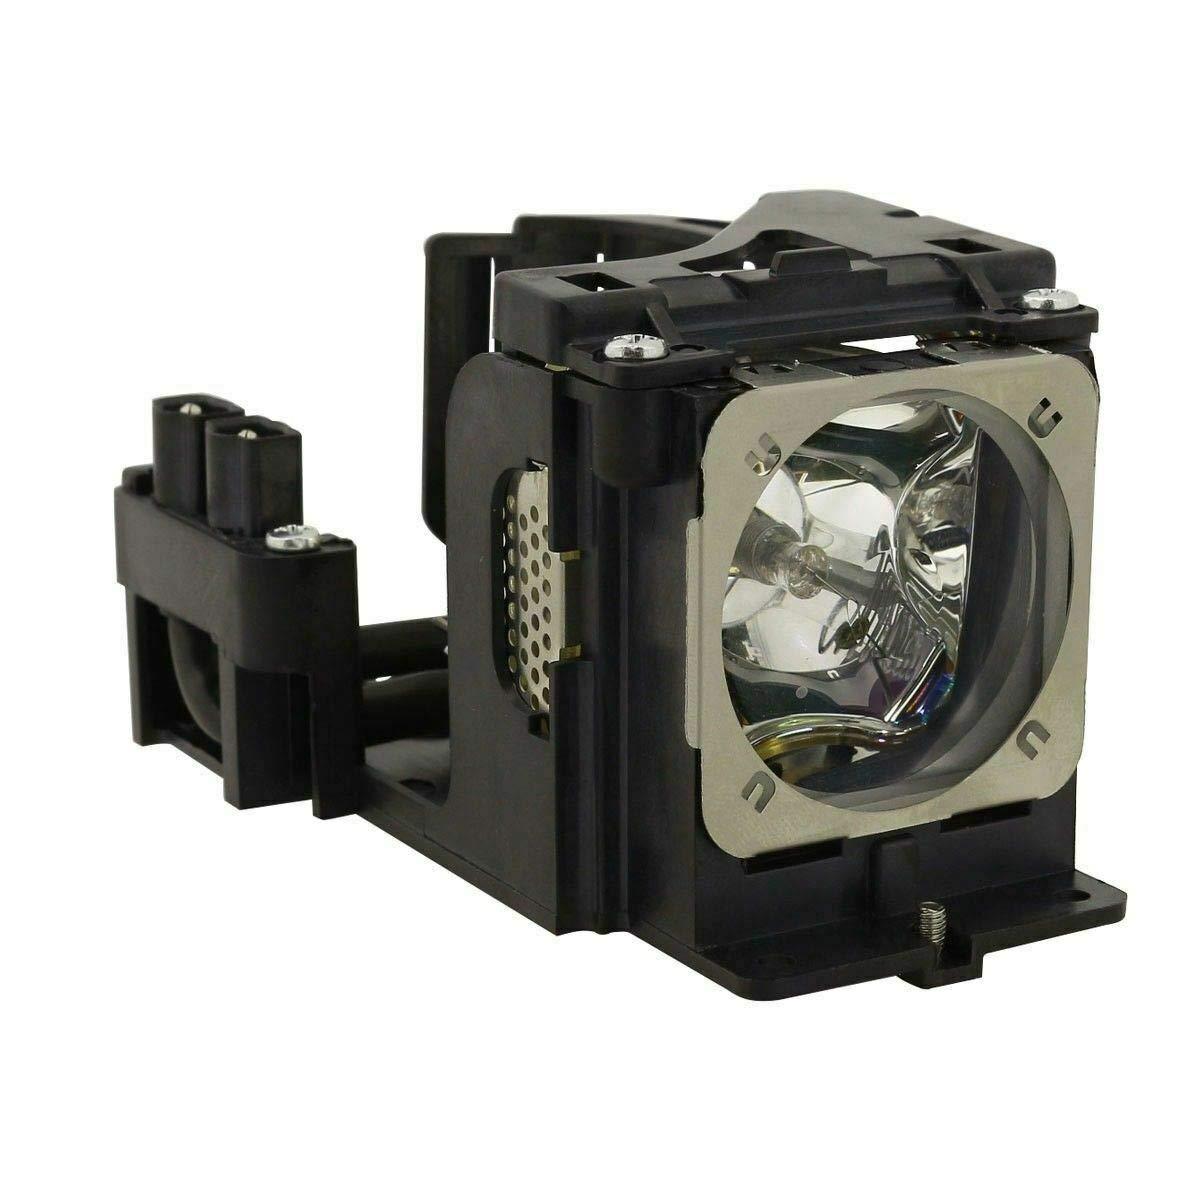 CTLAMP POA-LMP106 ハウジング付き交換用ランプ SANYO PLC-WXL46 / PLC-XE45 / PLC-XL45 / PLC-XL45Sに対応   B07NVDGWQ6